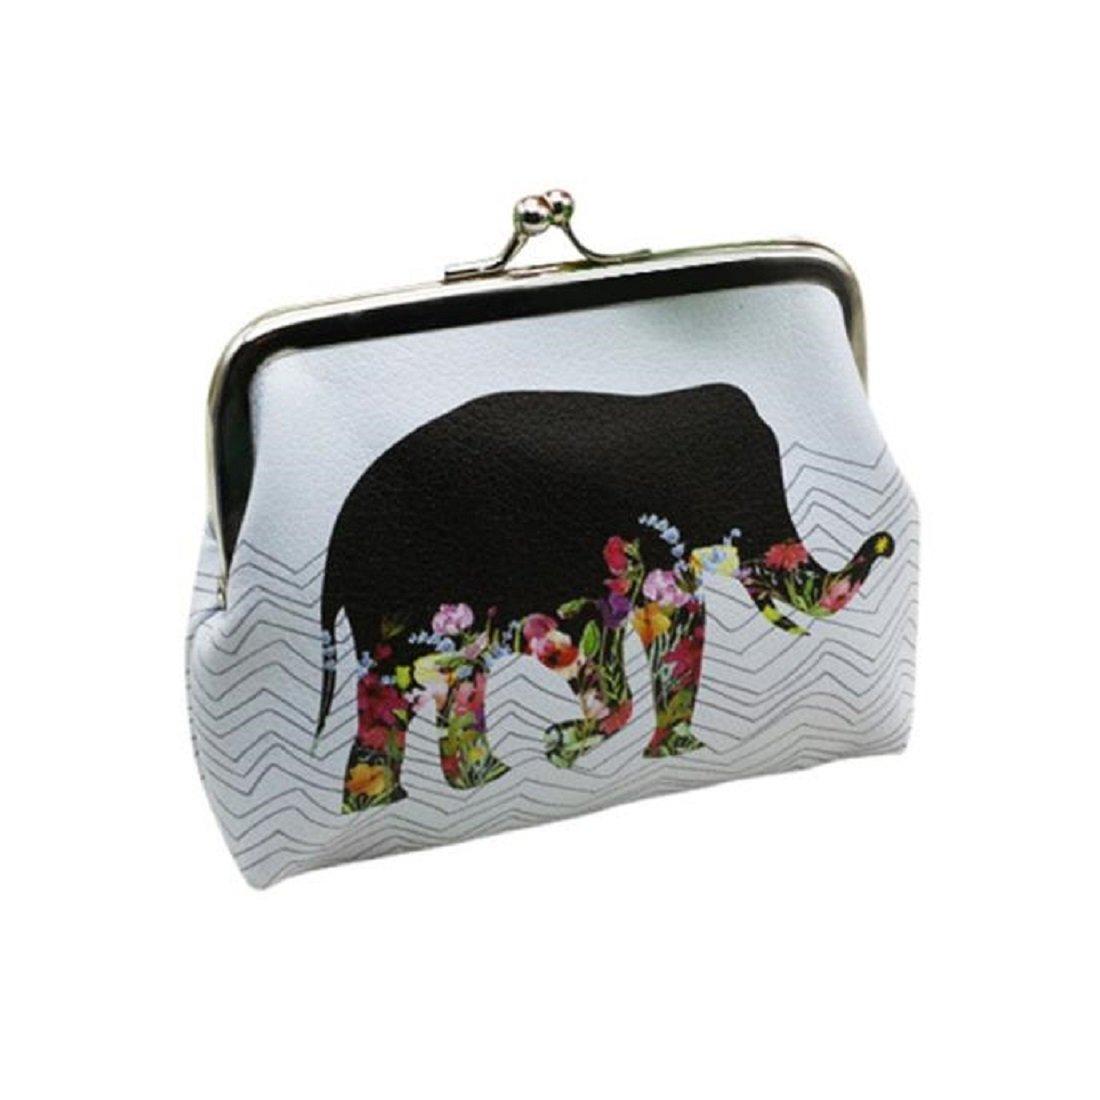 Toraway Wallet, Vintage Womens Elephant Wallet Card Holder Coin Purse Clutch Handbag White